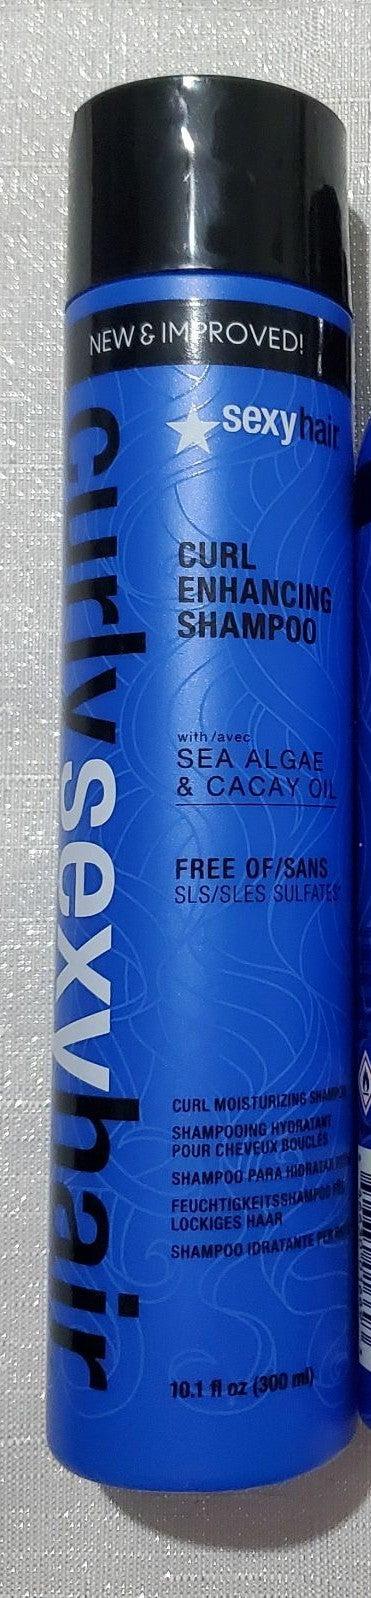 Curly Sexy Hair Shampoo